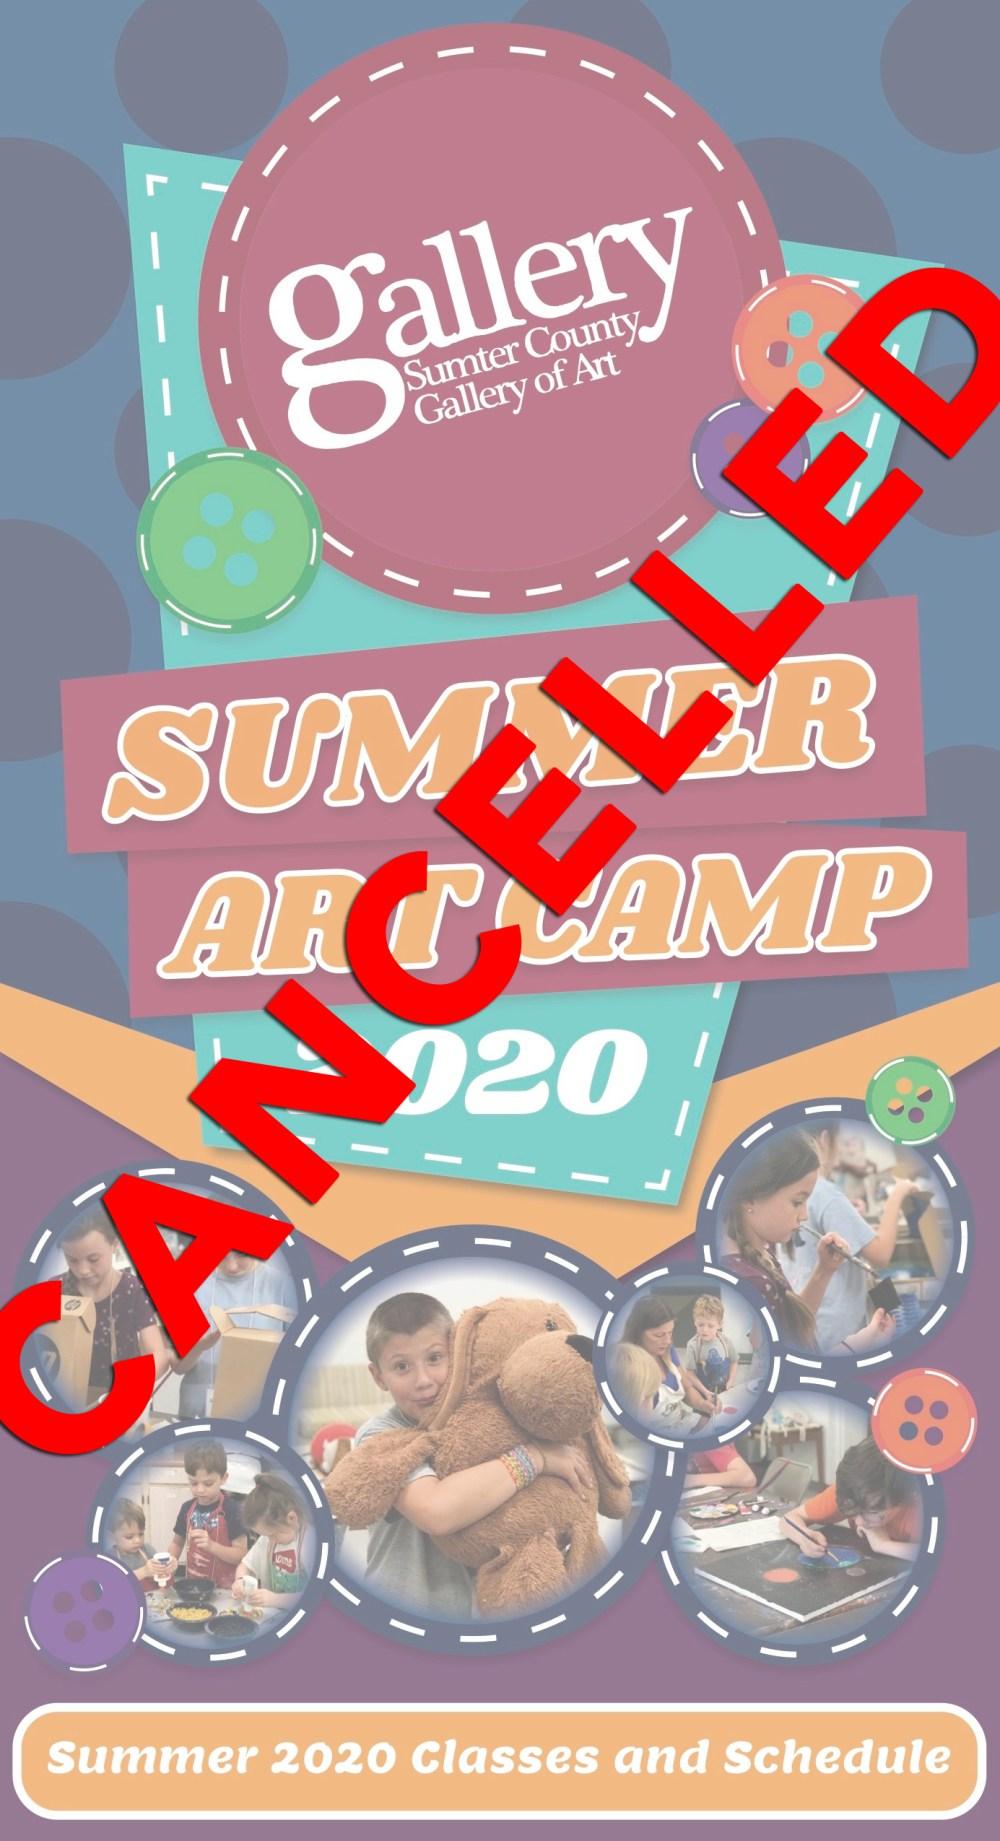 cancelledfdsaartcamp